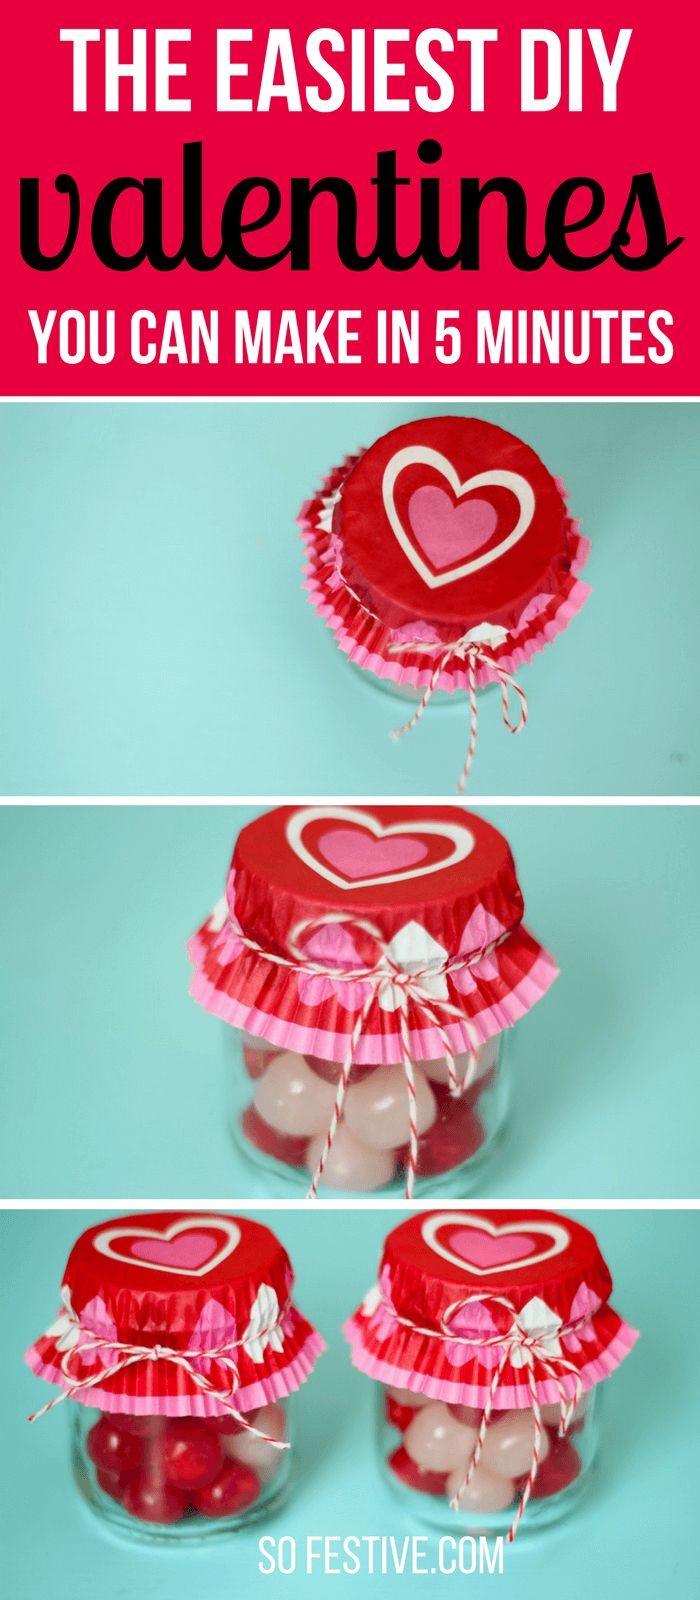 5-Minuten DIY Babynahrungsglas Valentines   – Holidays and Special Occasions ♥ Recipes, Decor, DIY, Crafts ♥